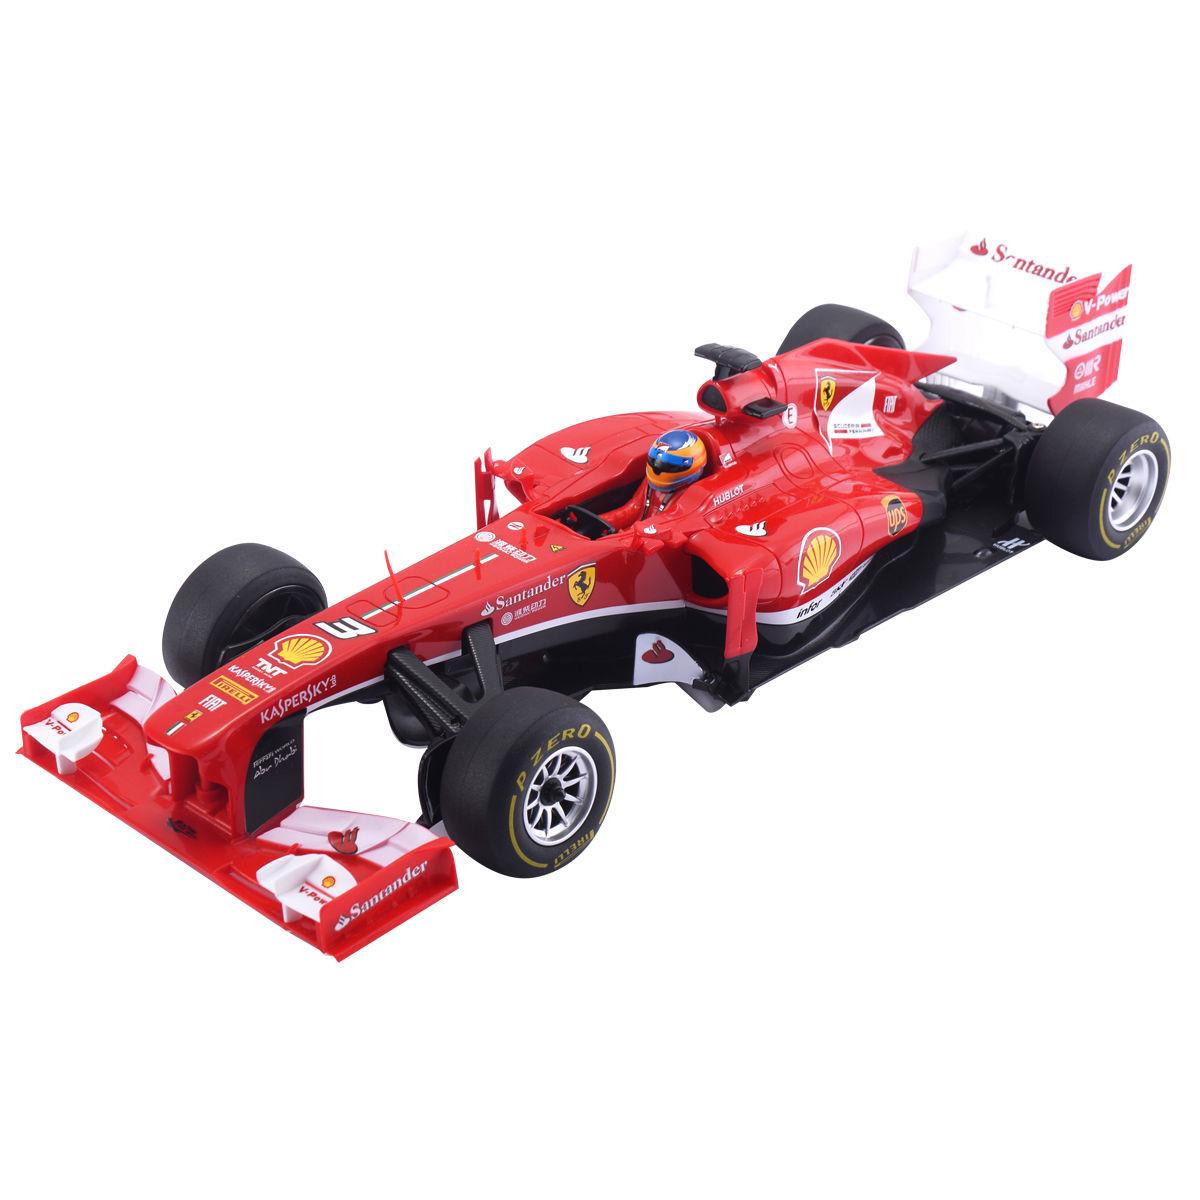 1/12 Ferrari F138 Licensed Electric Speed Racing Car Formula One F1 RC Car Red TY558749